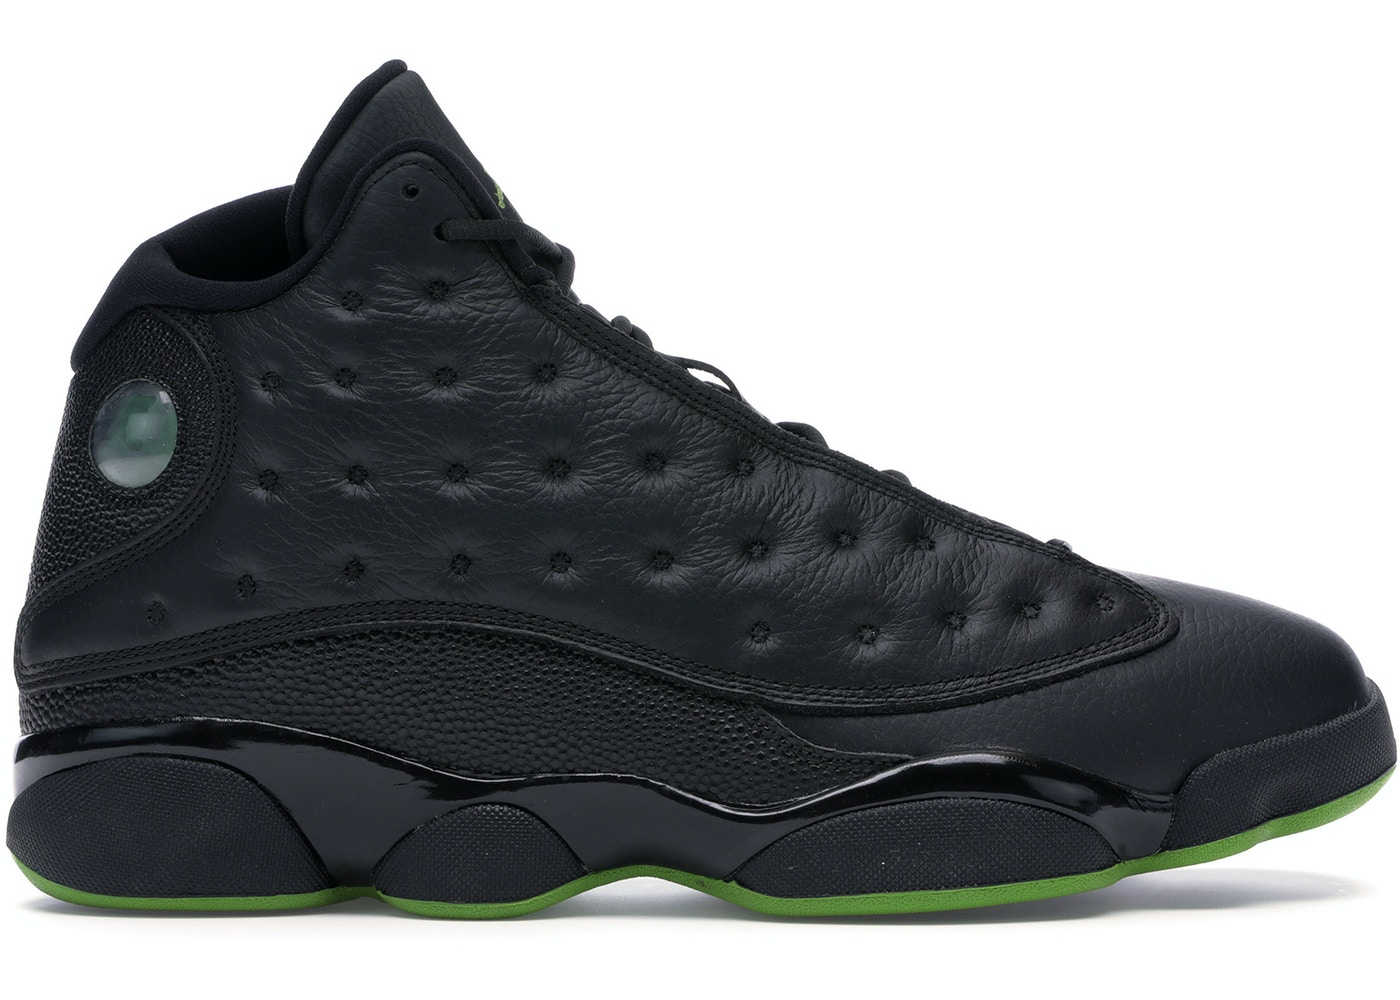 lowest price c3bf0 7d4b2 Buy Air Jordan 13 Shoes   Deadstock Sneakers